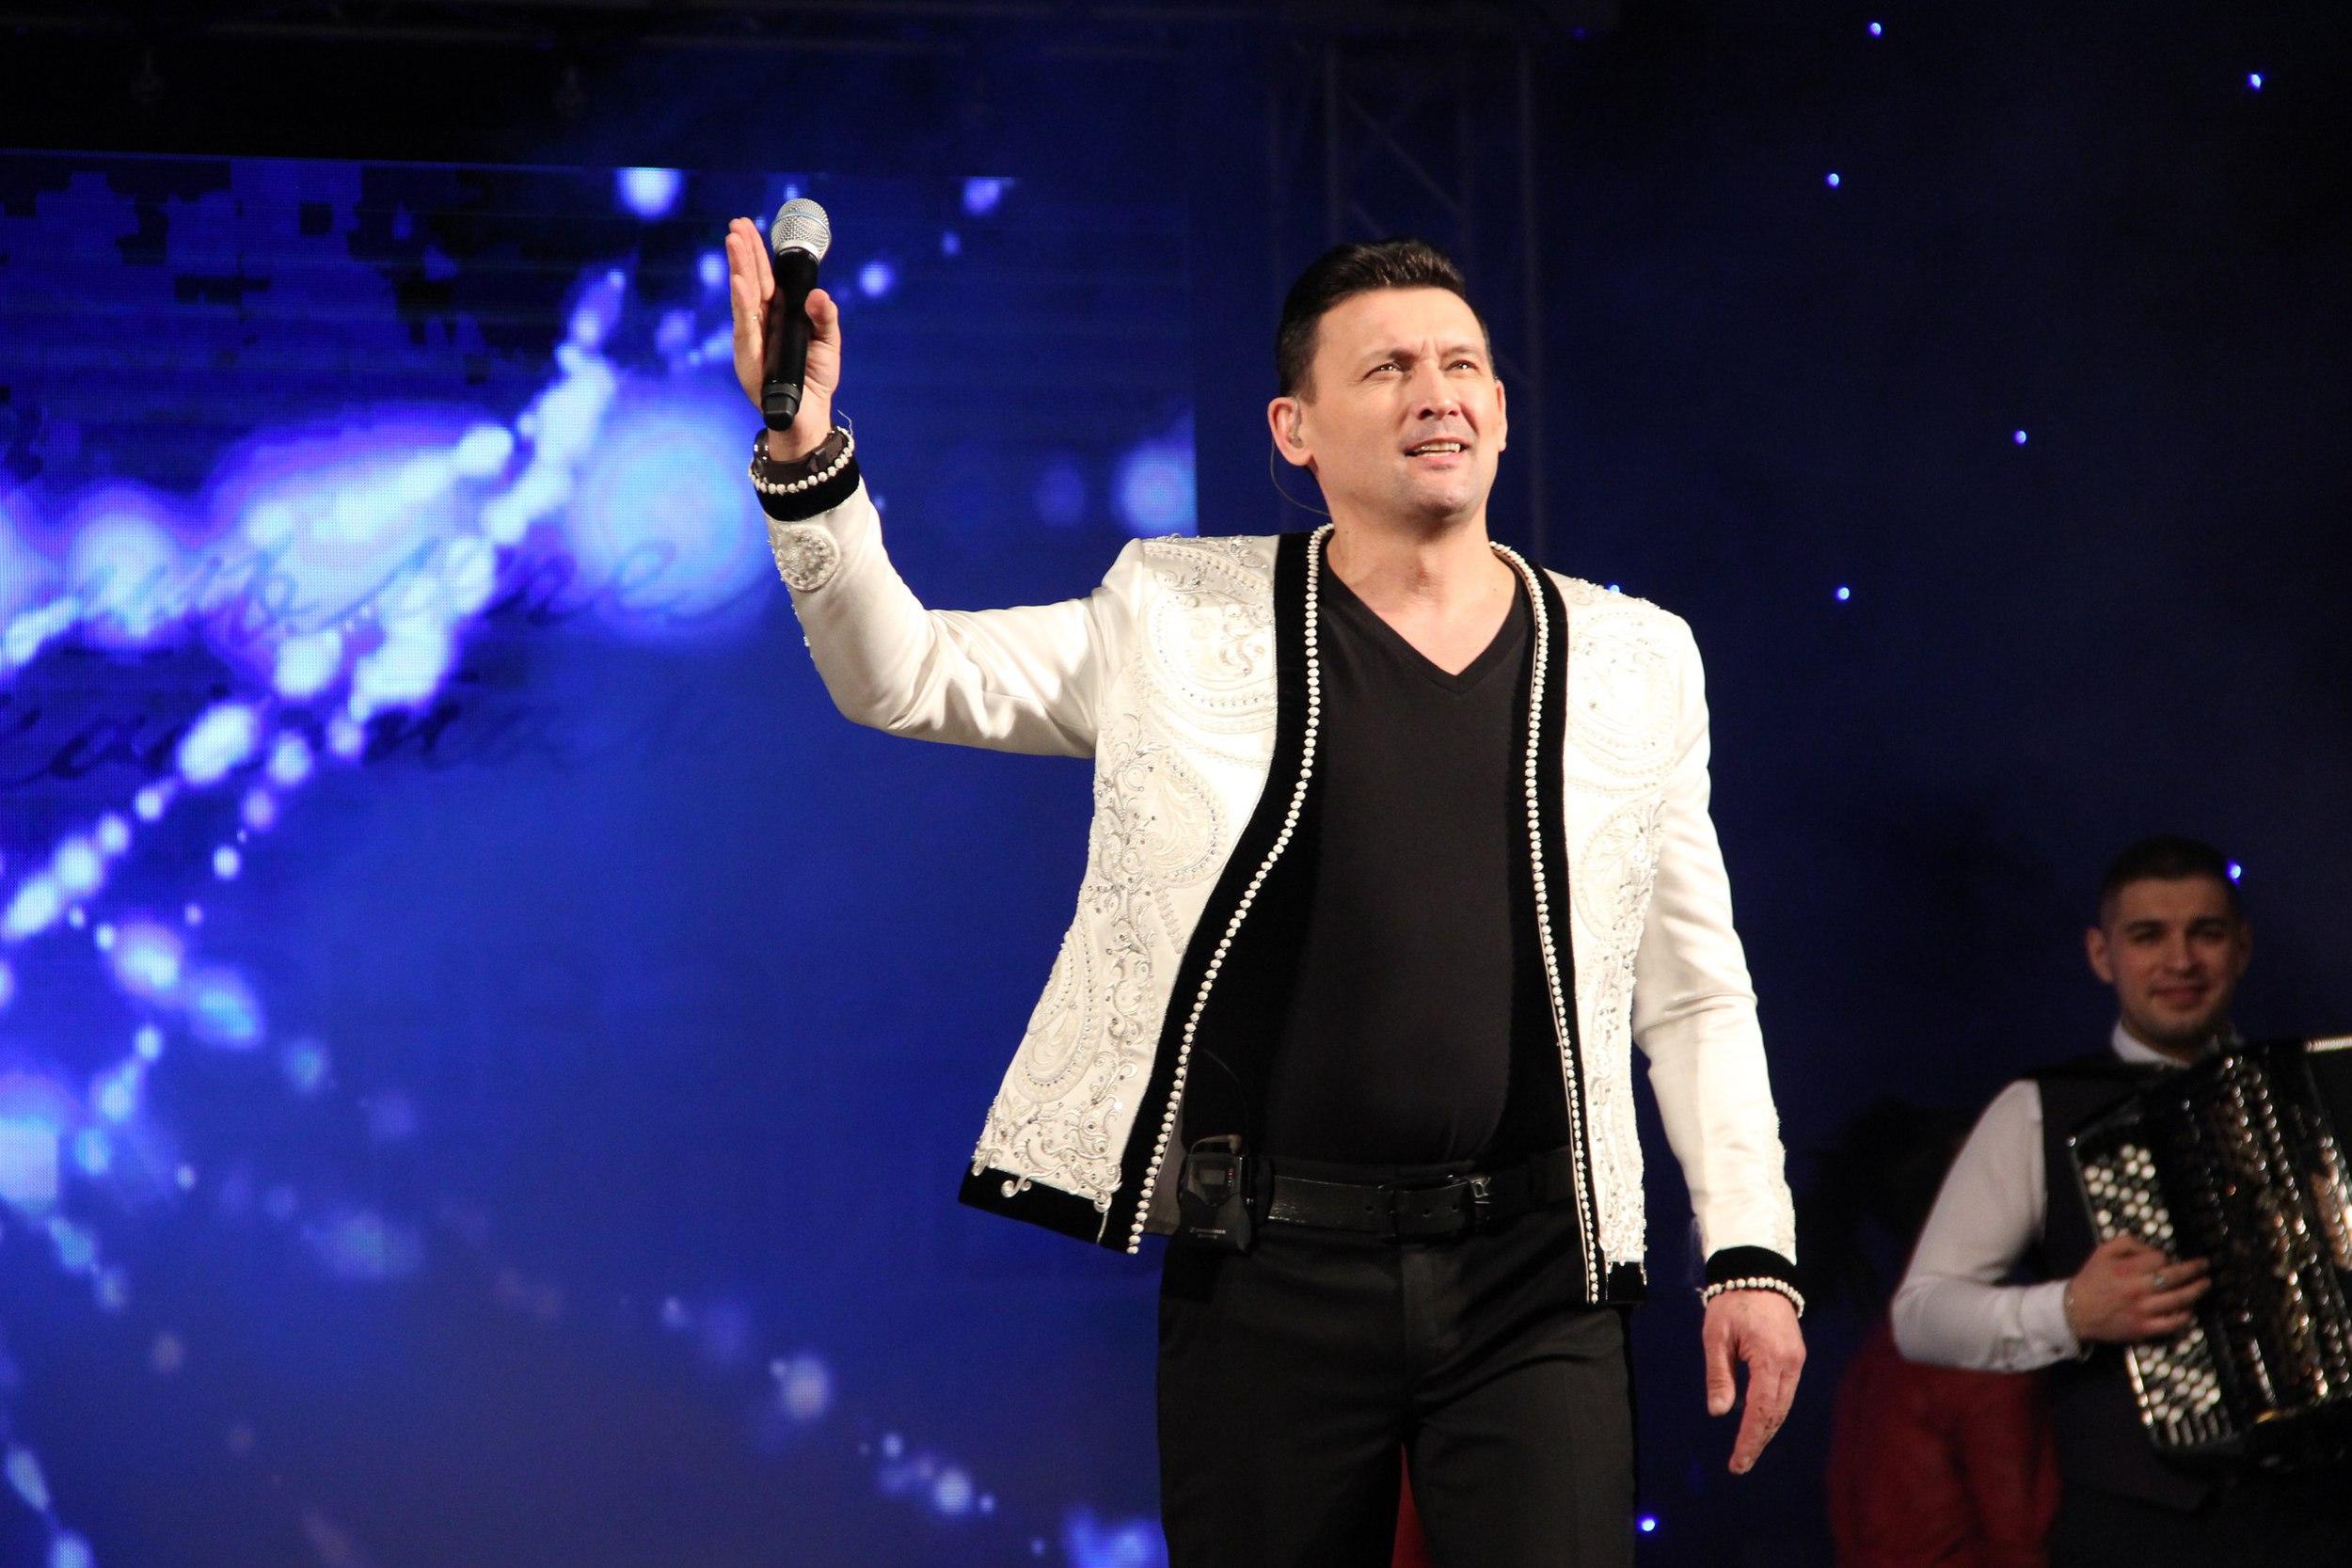 певец Анвар Нургалиев